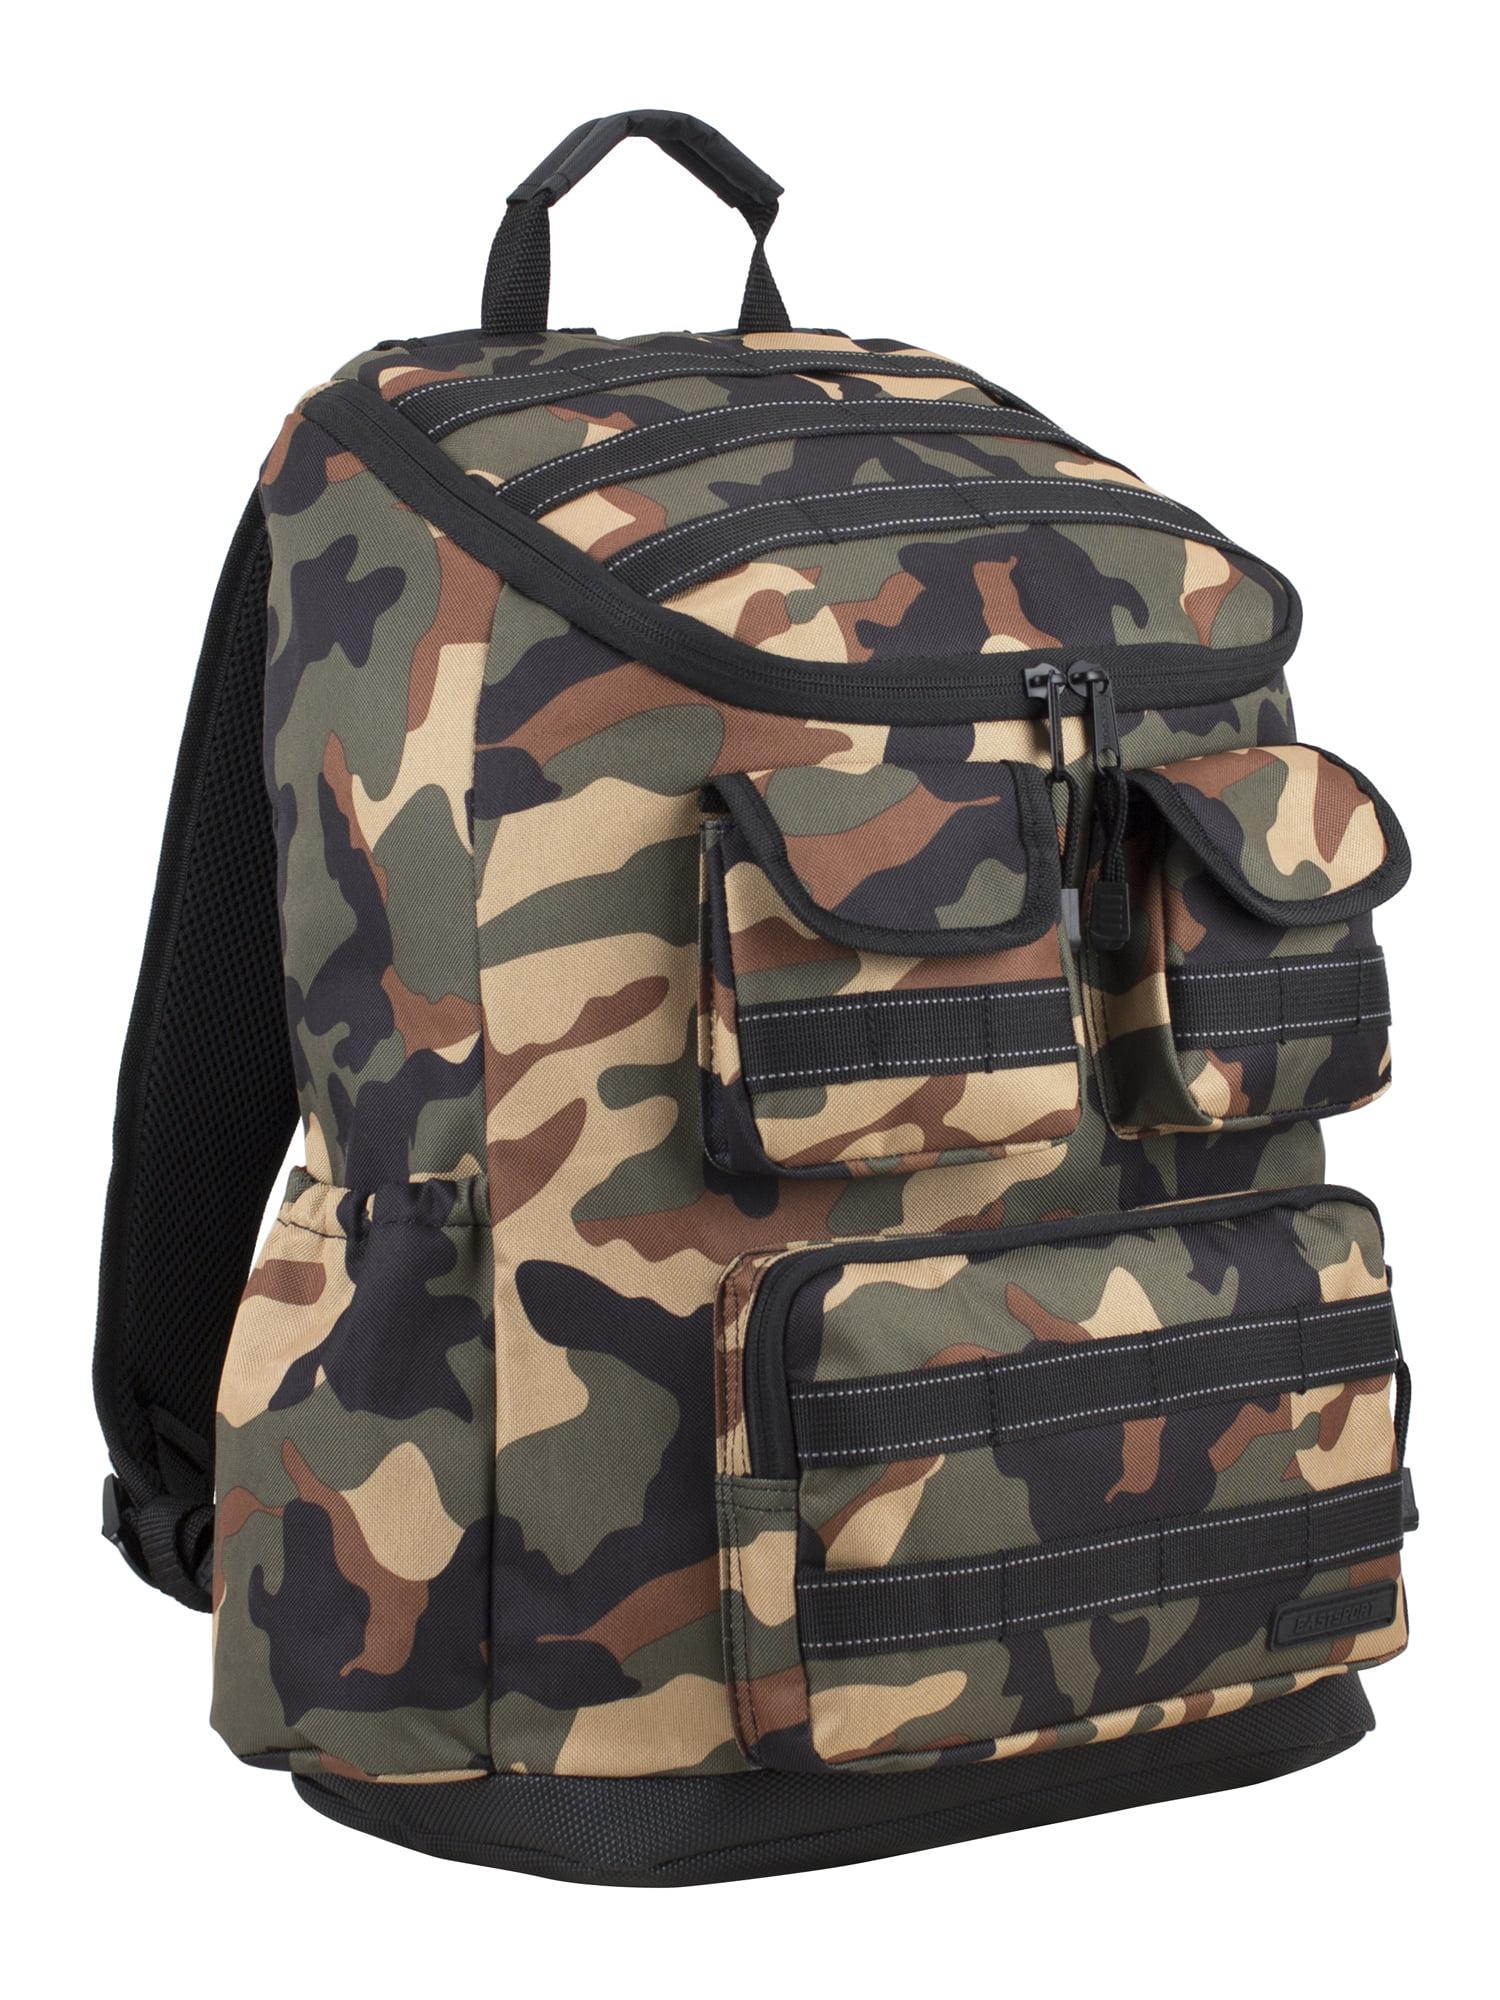 Moda West Ultra Lightweight Foldable Backpack for Men and Women Hiking Daypack Sport Travel Bag Multiple Colors